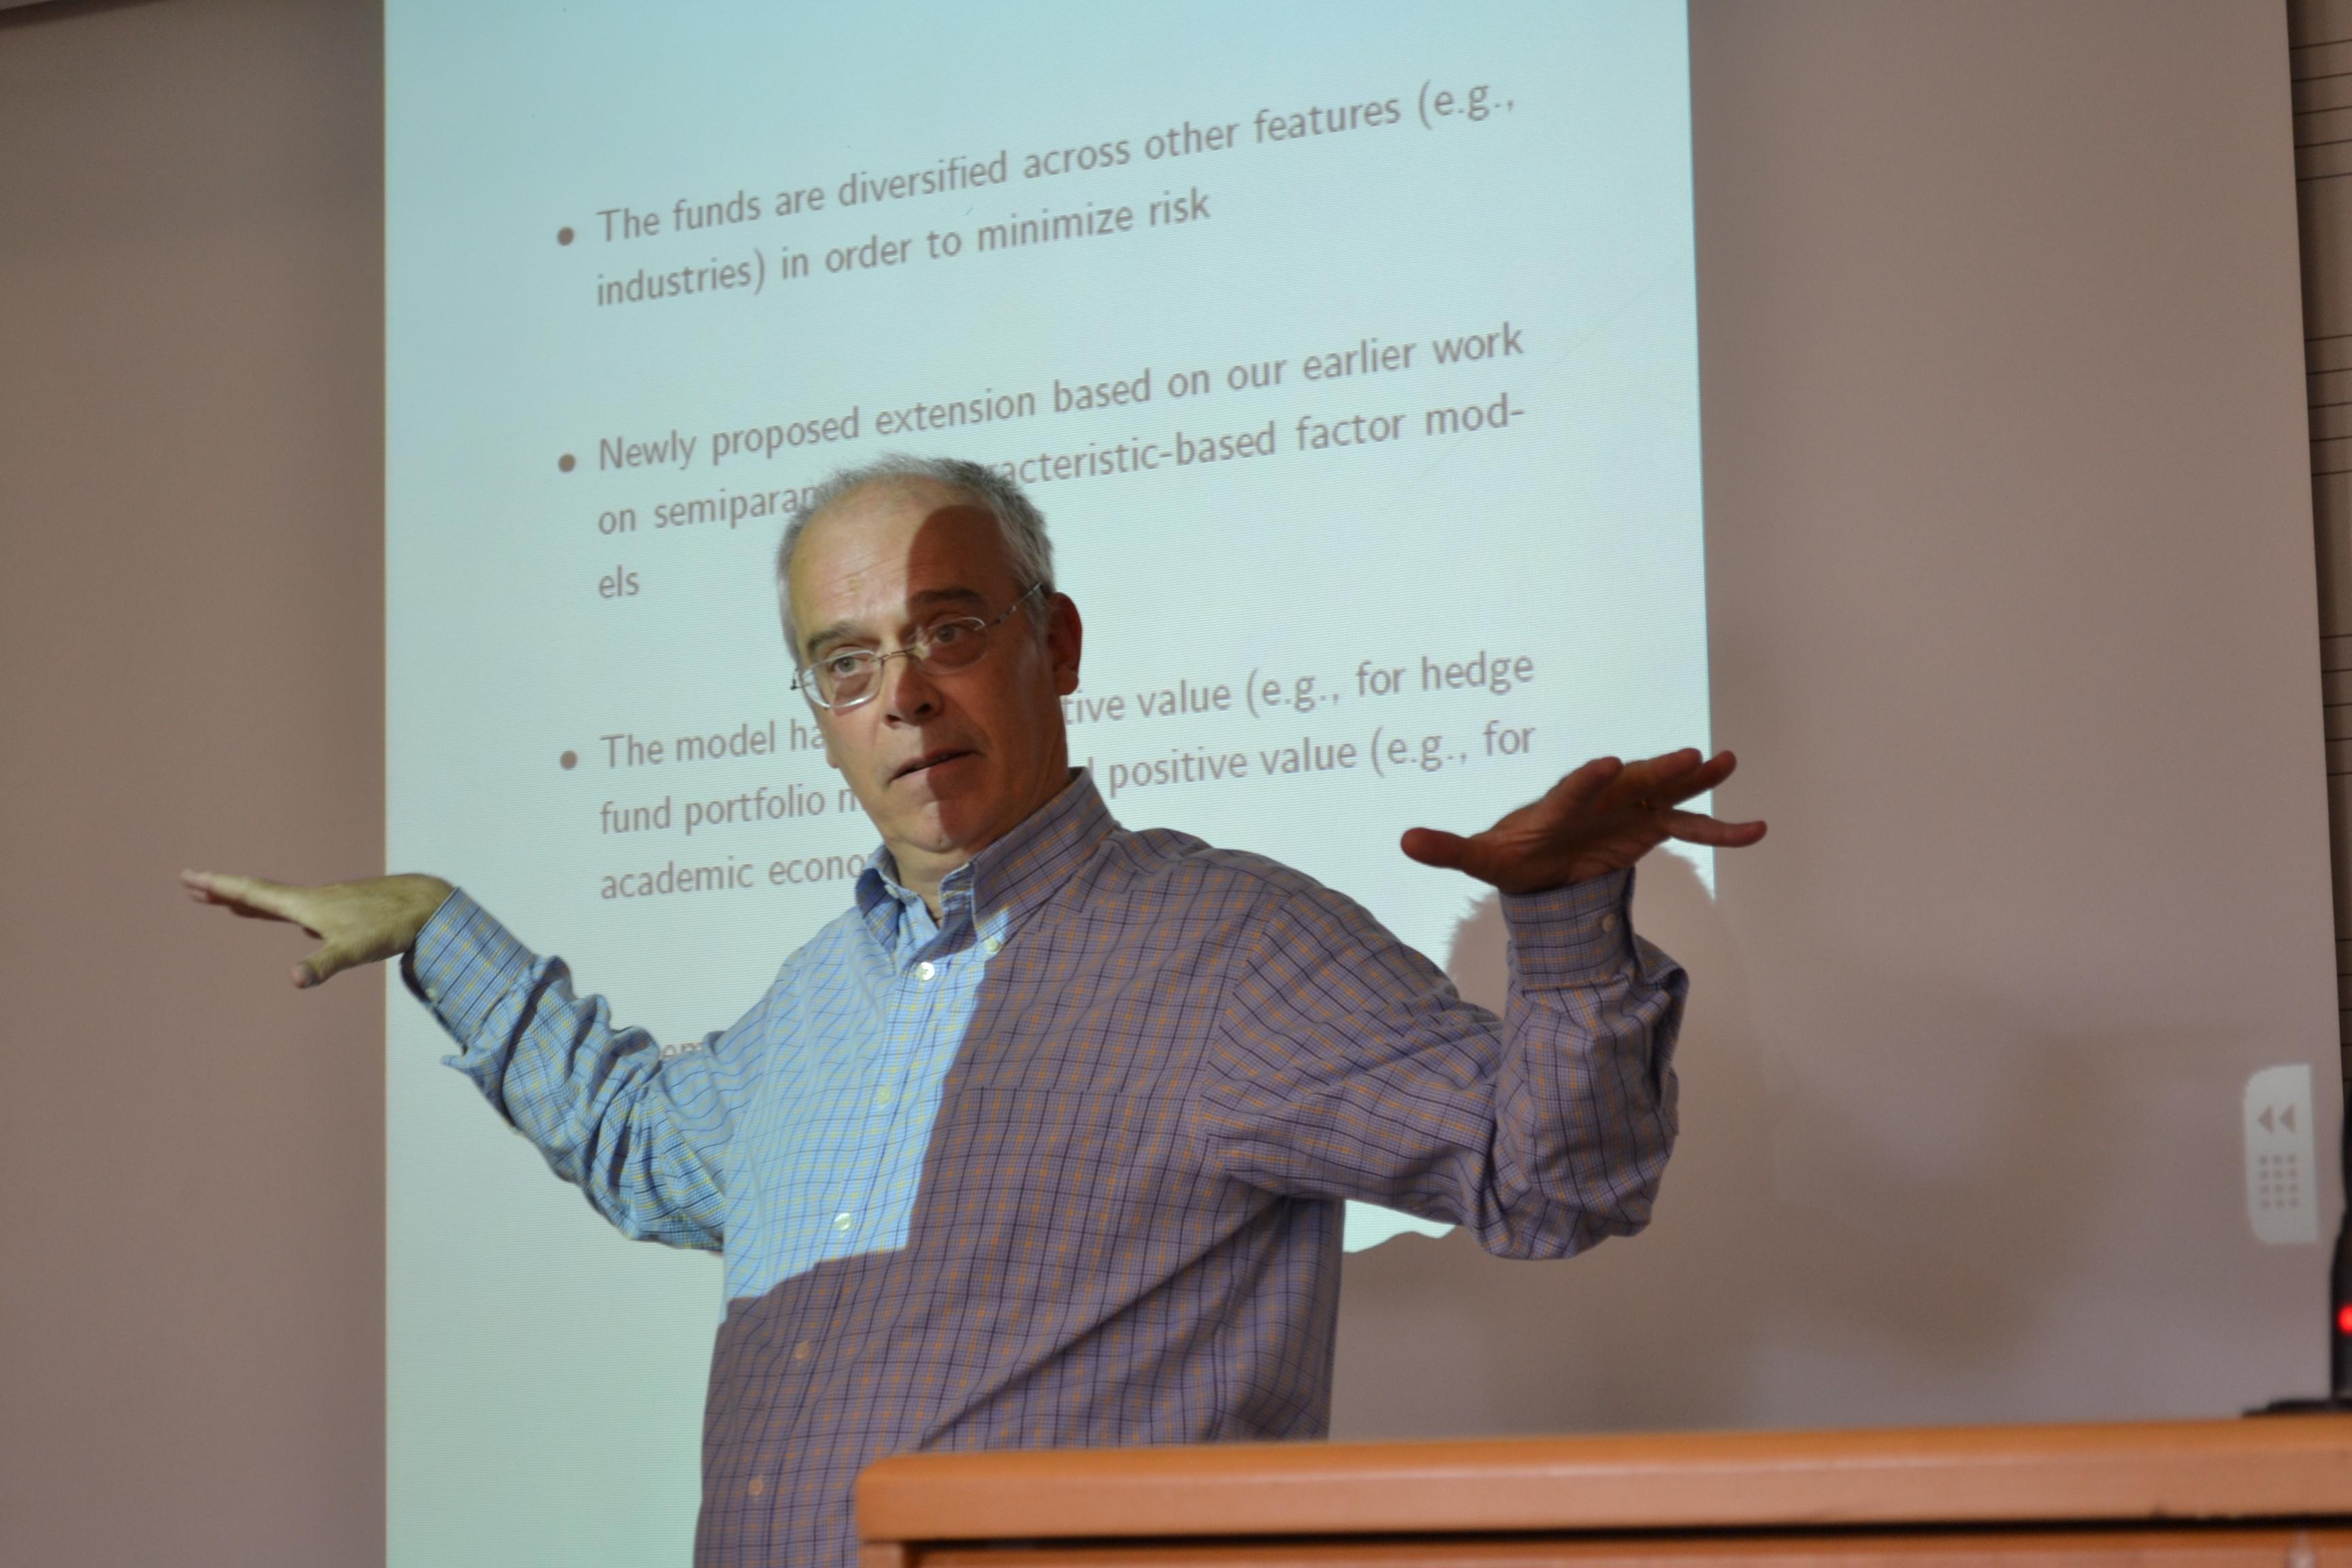 Professor Gregroy Conor 2 - Maynooth University